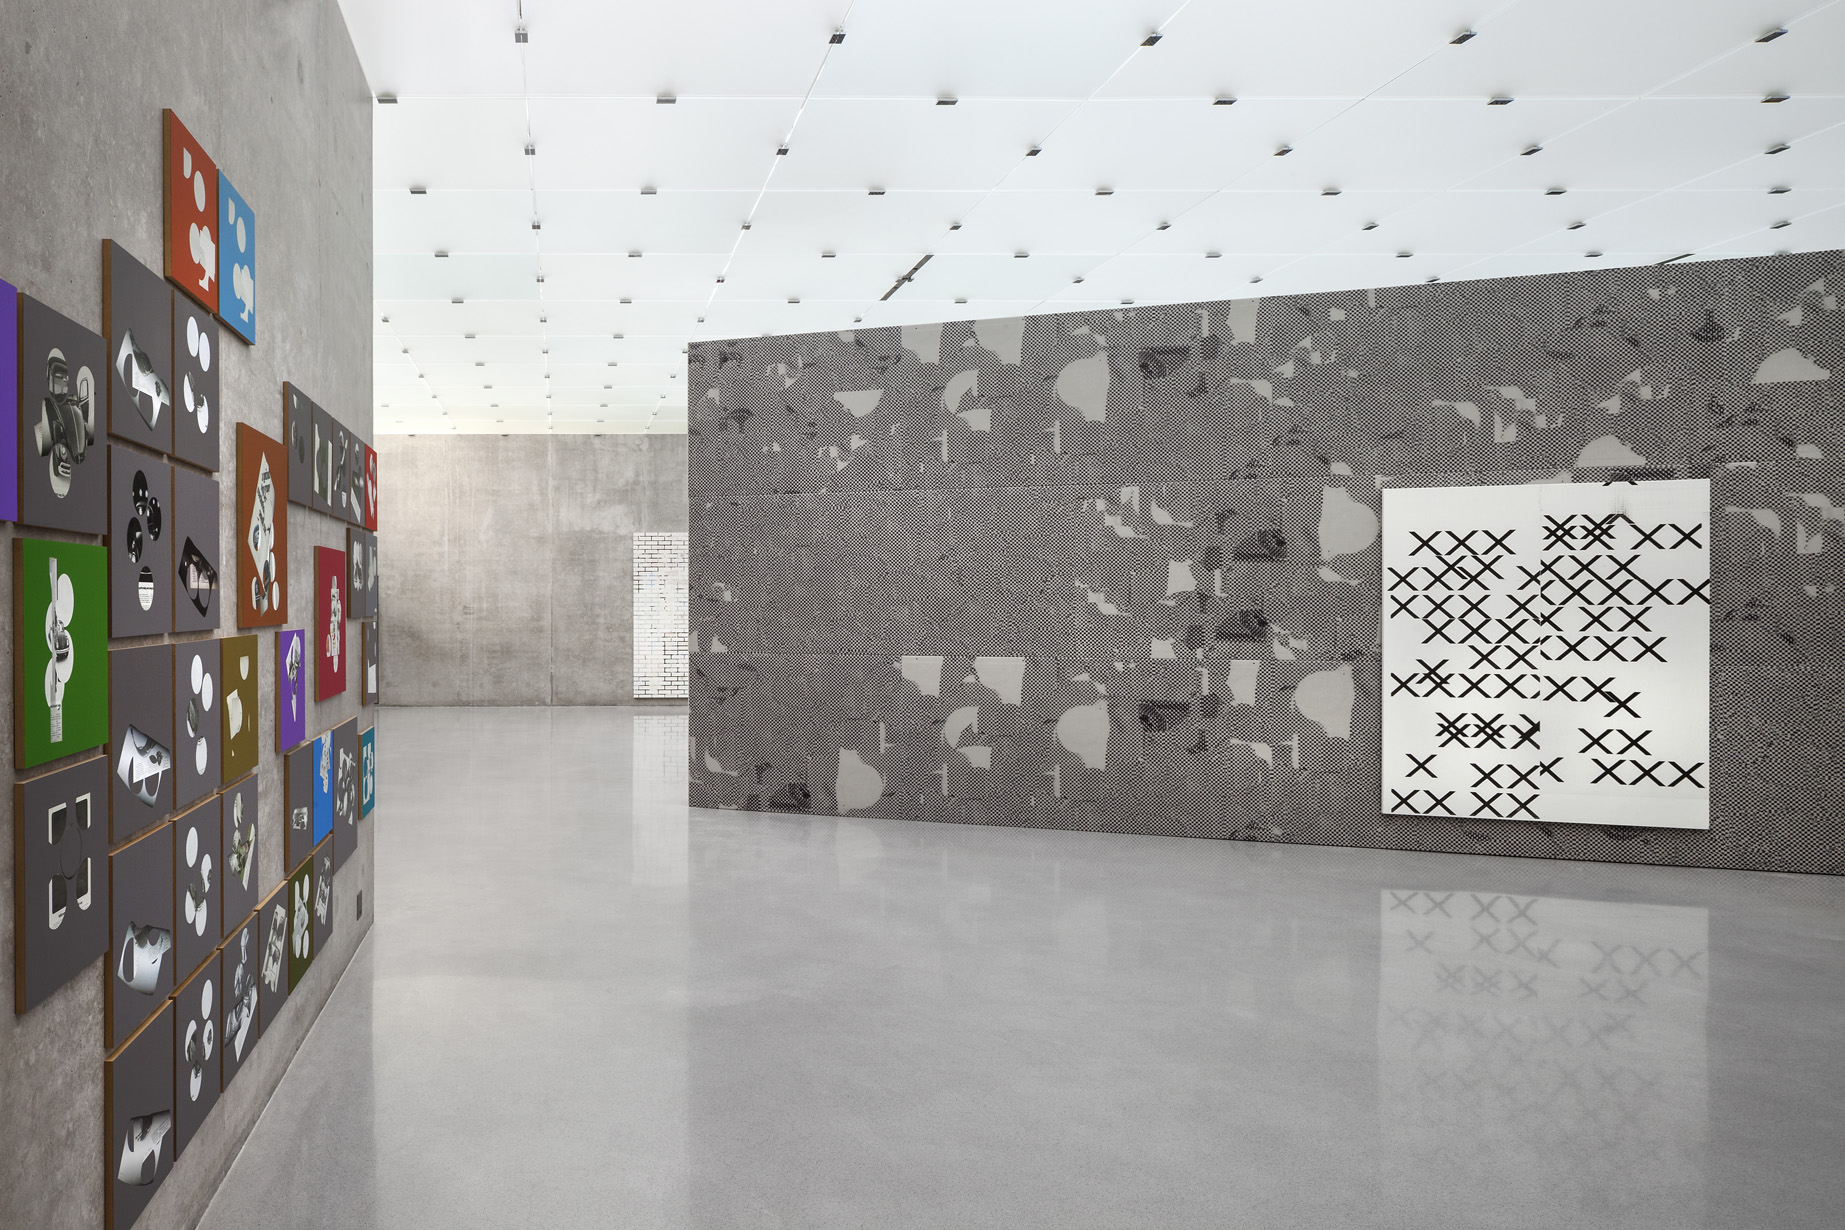 Wade Guyton, Guyton\Walker, Kelley Walker , Kunsthaus Bregenz, Austria, 2013, exhibition view